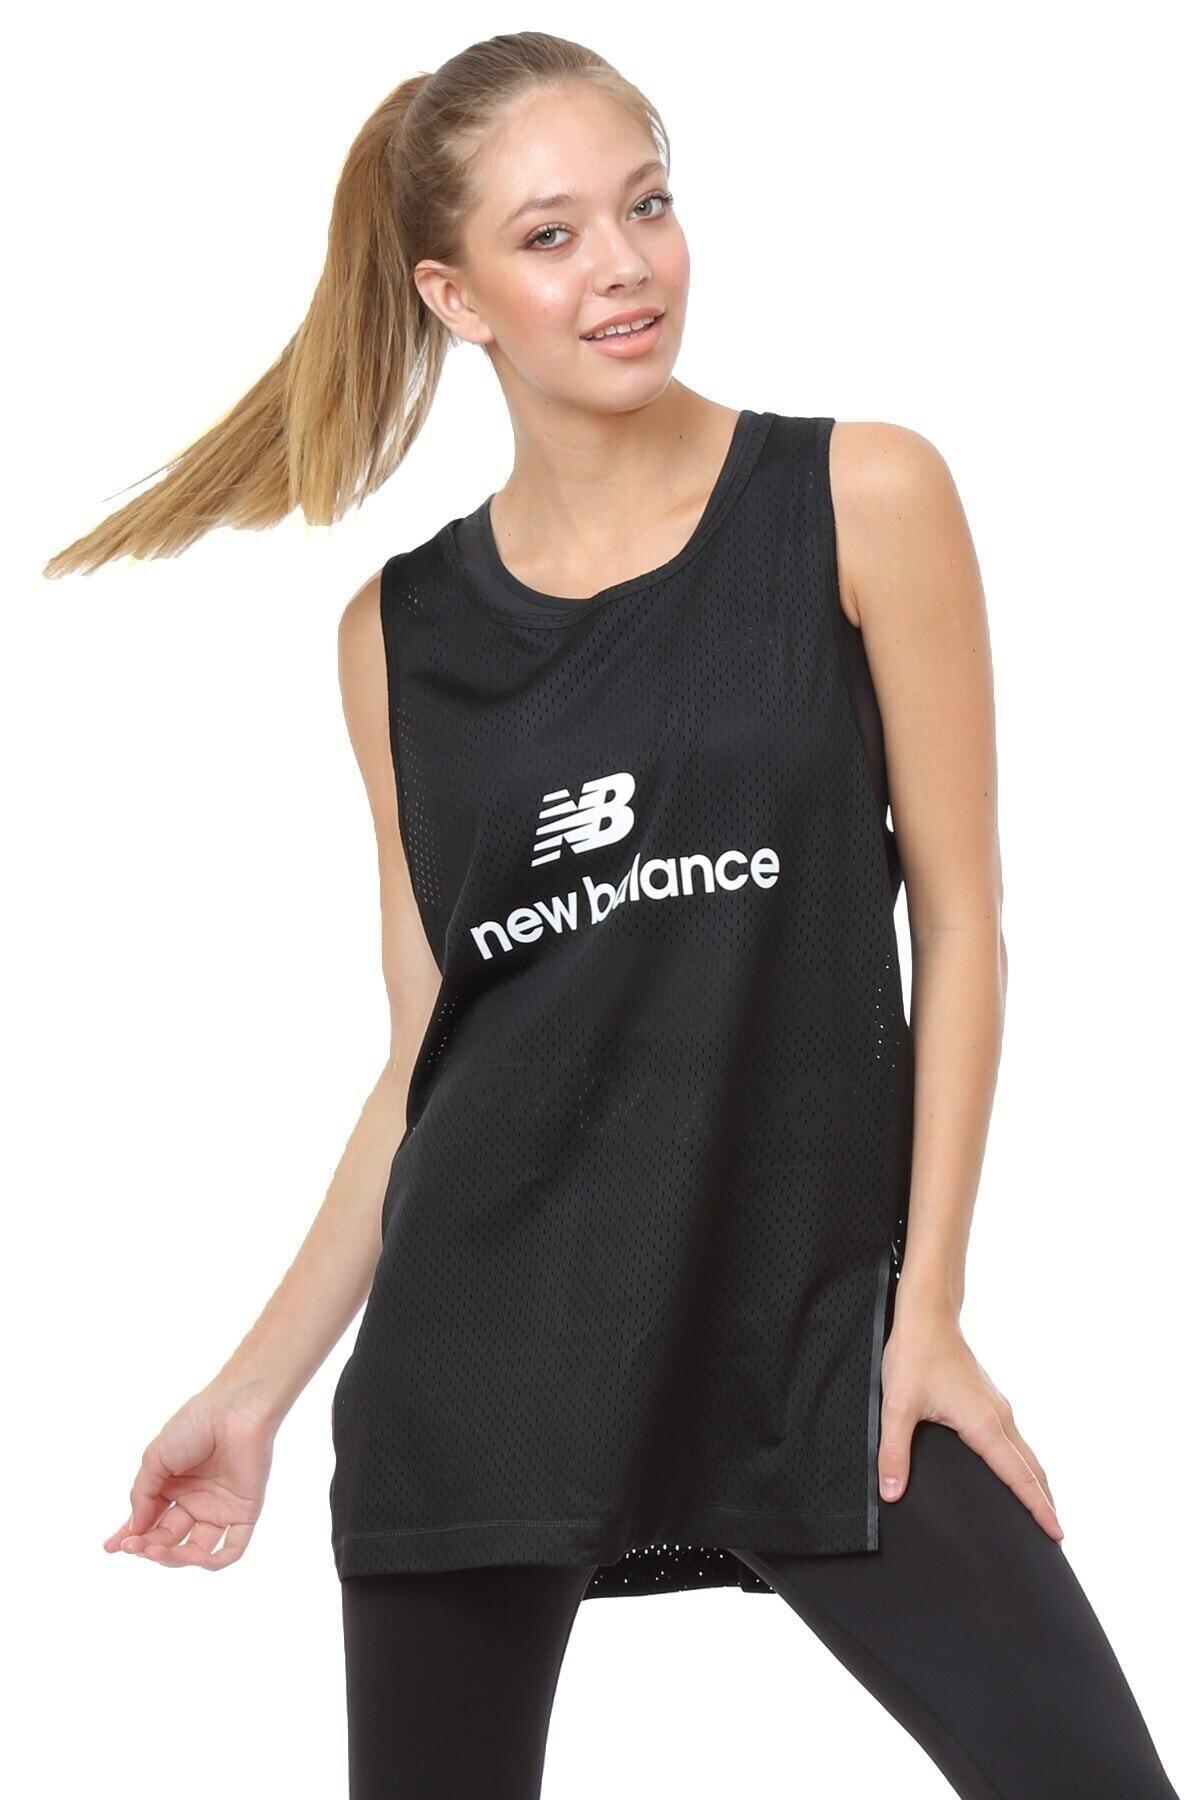 New Balance Kadın Siyah Atlet Nbtw2006-bk 2